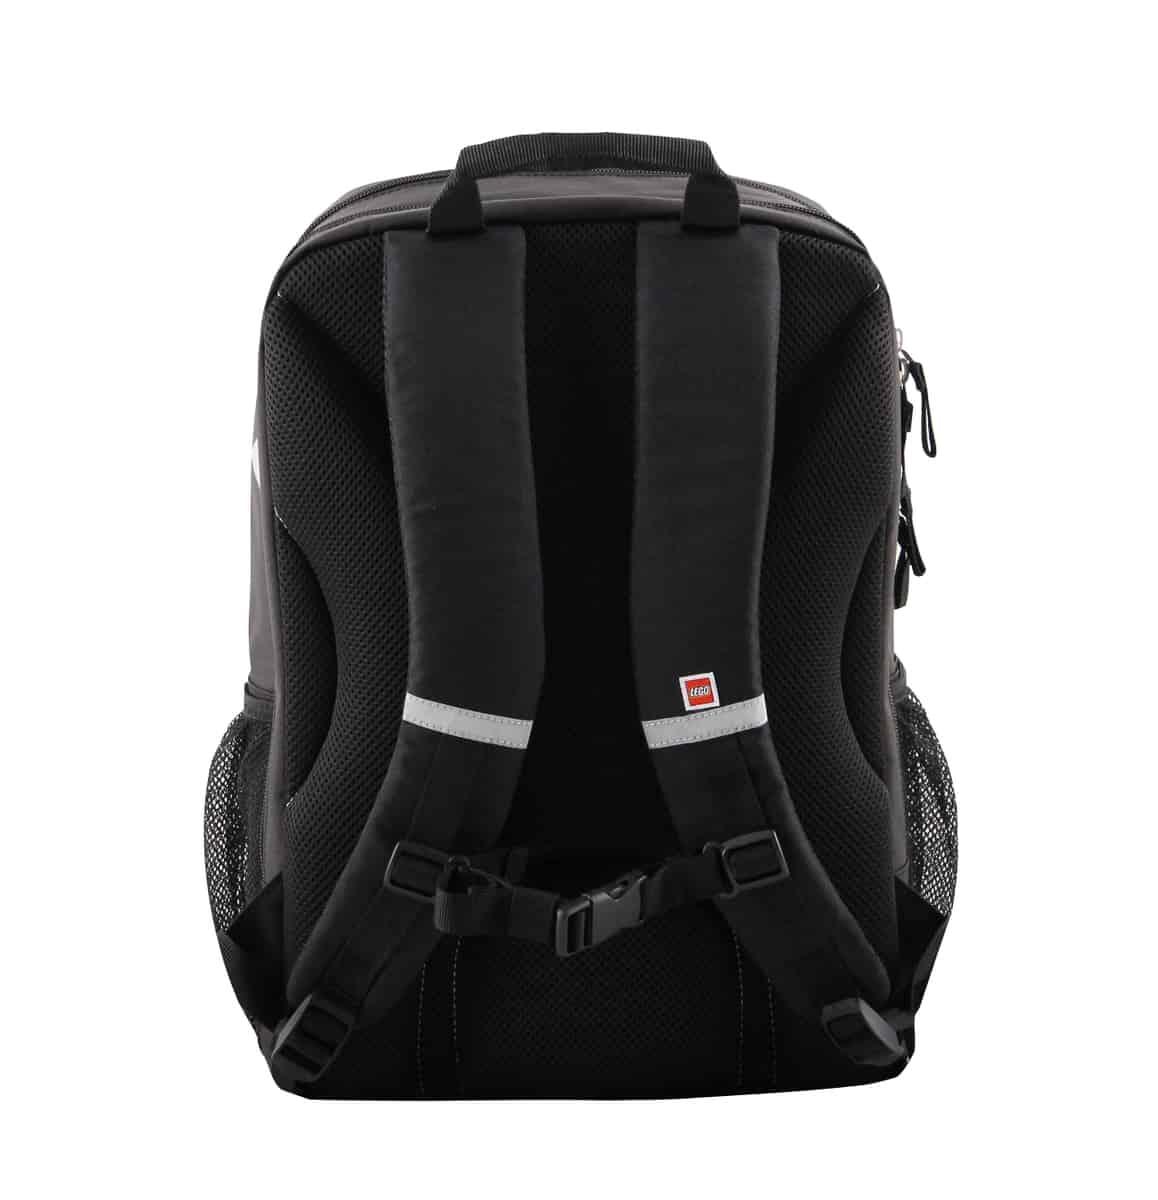 lego 5005918 minifigure belight backpack